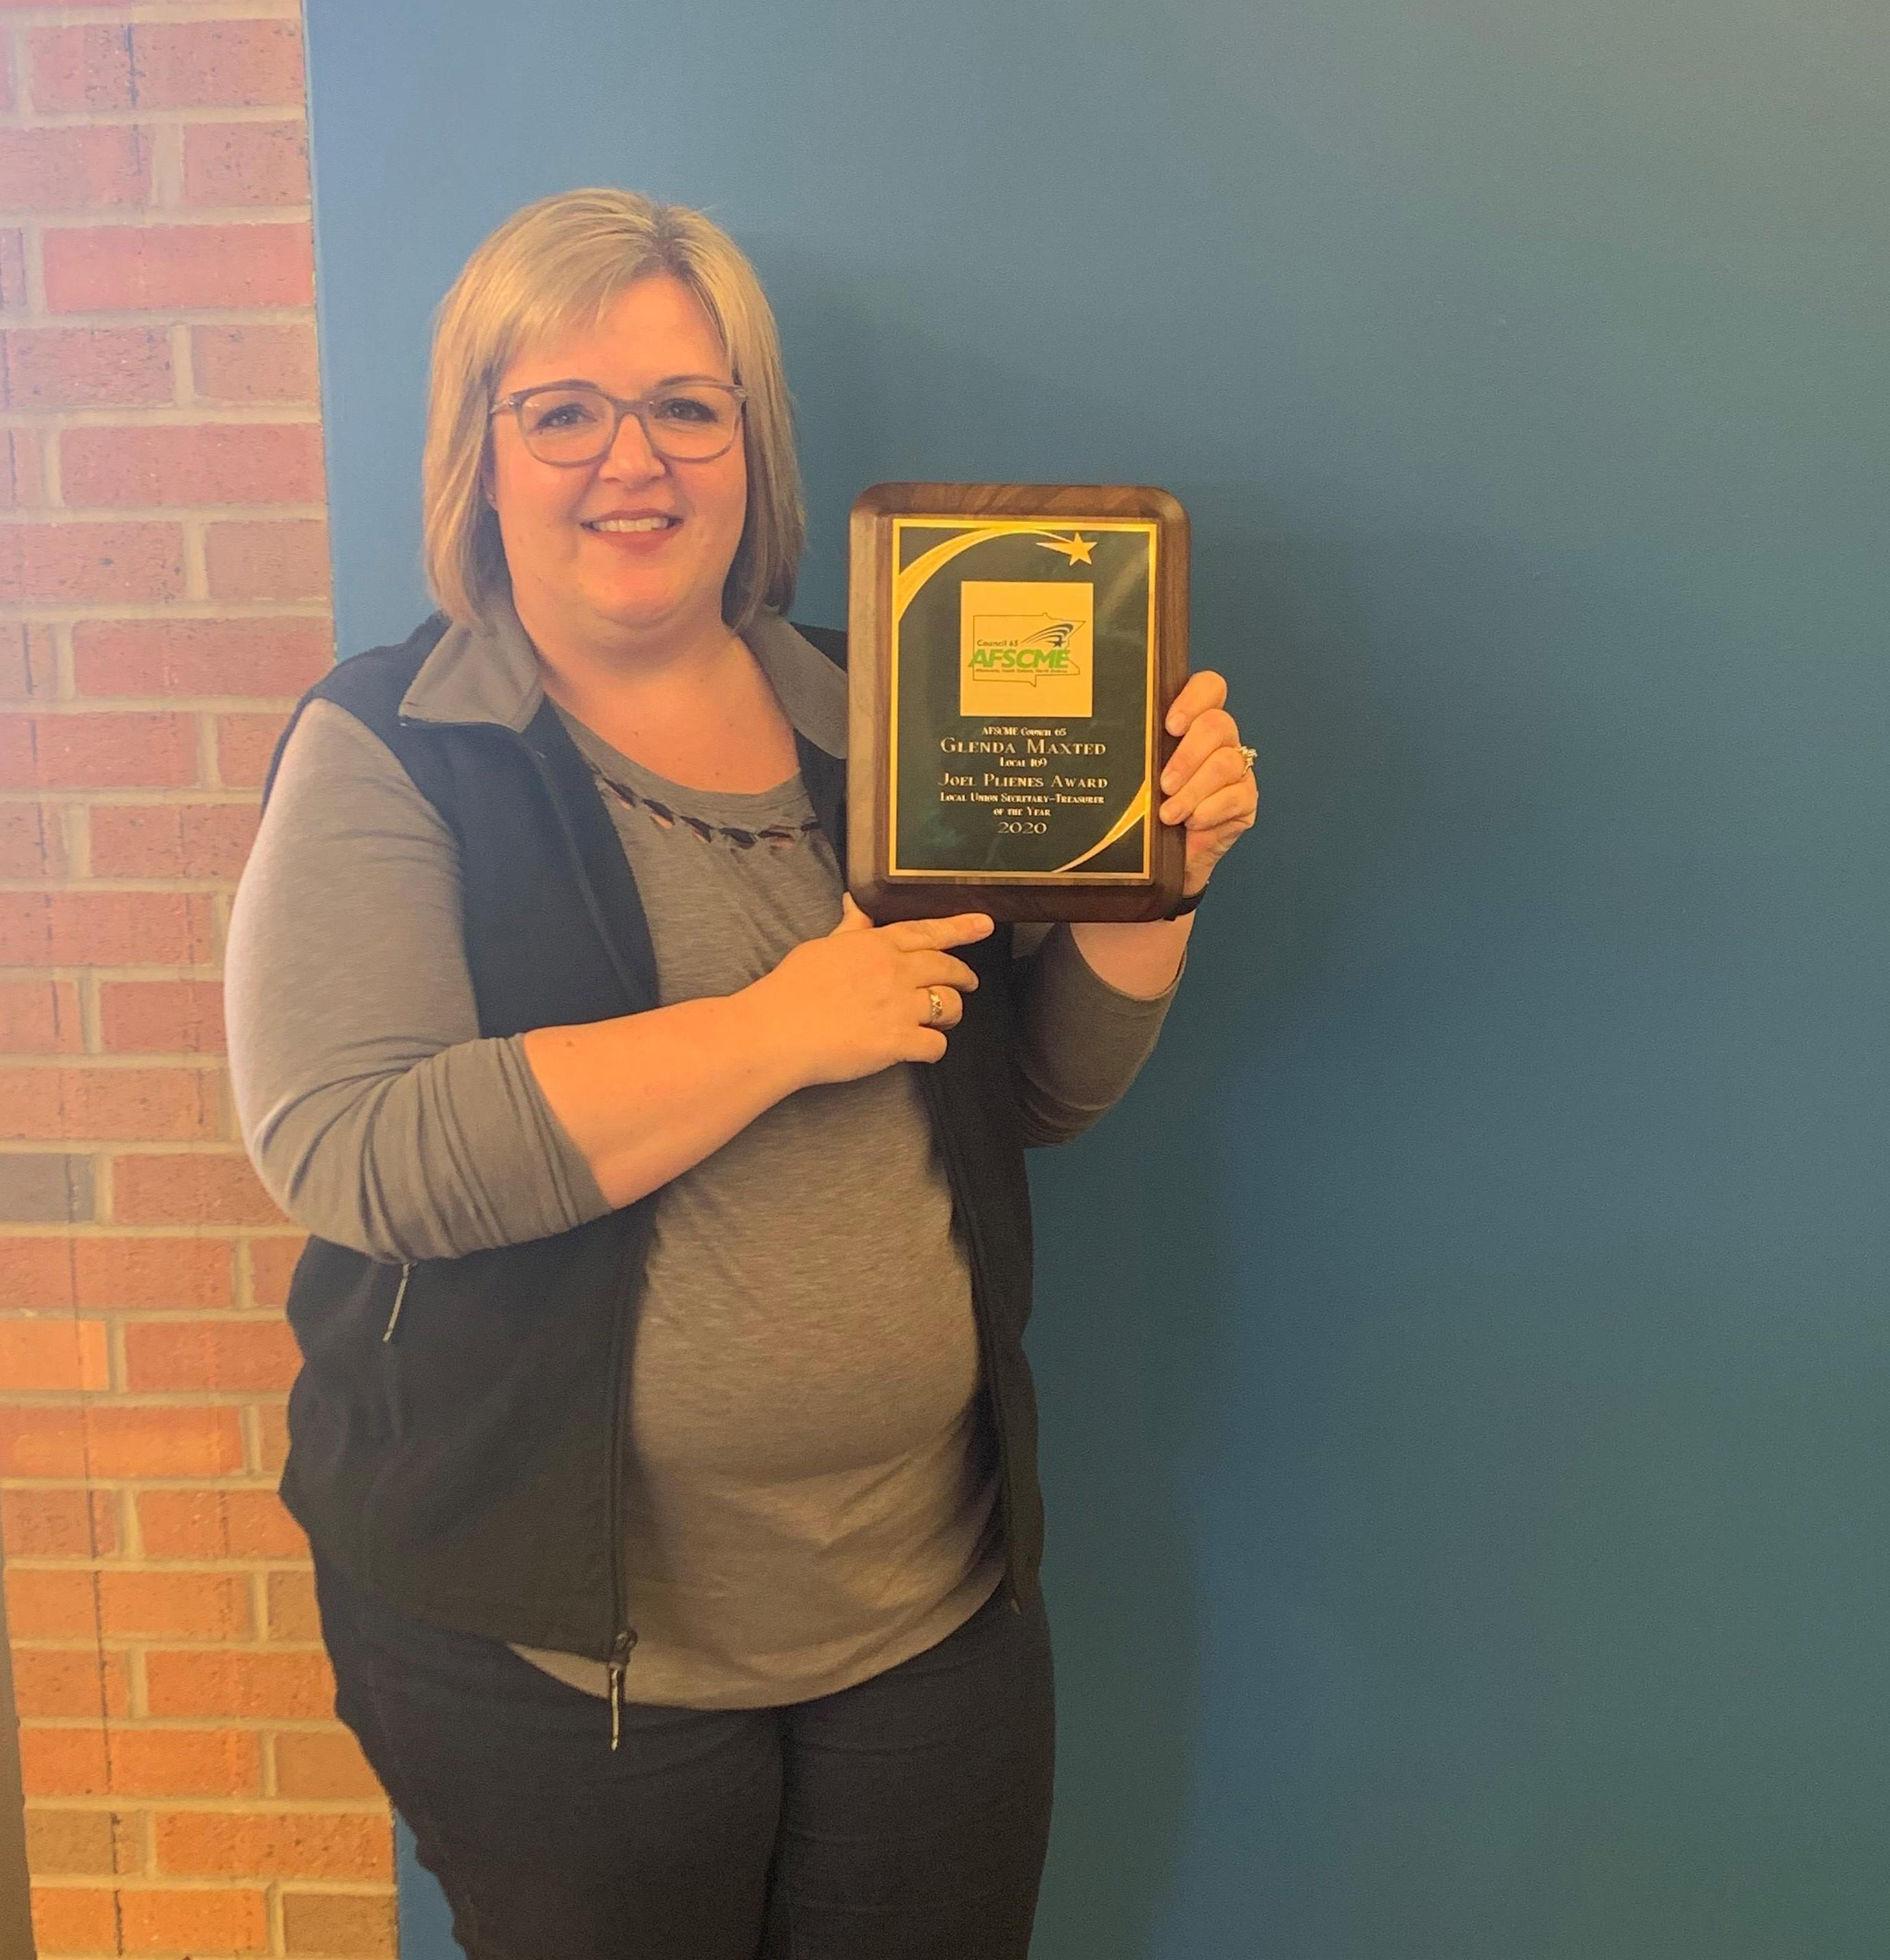 Glenda Maxted of Local 169 receives the 2020 Joel Plienis Award